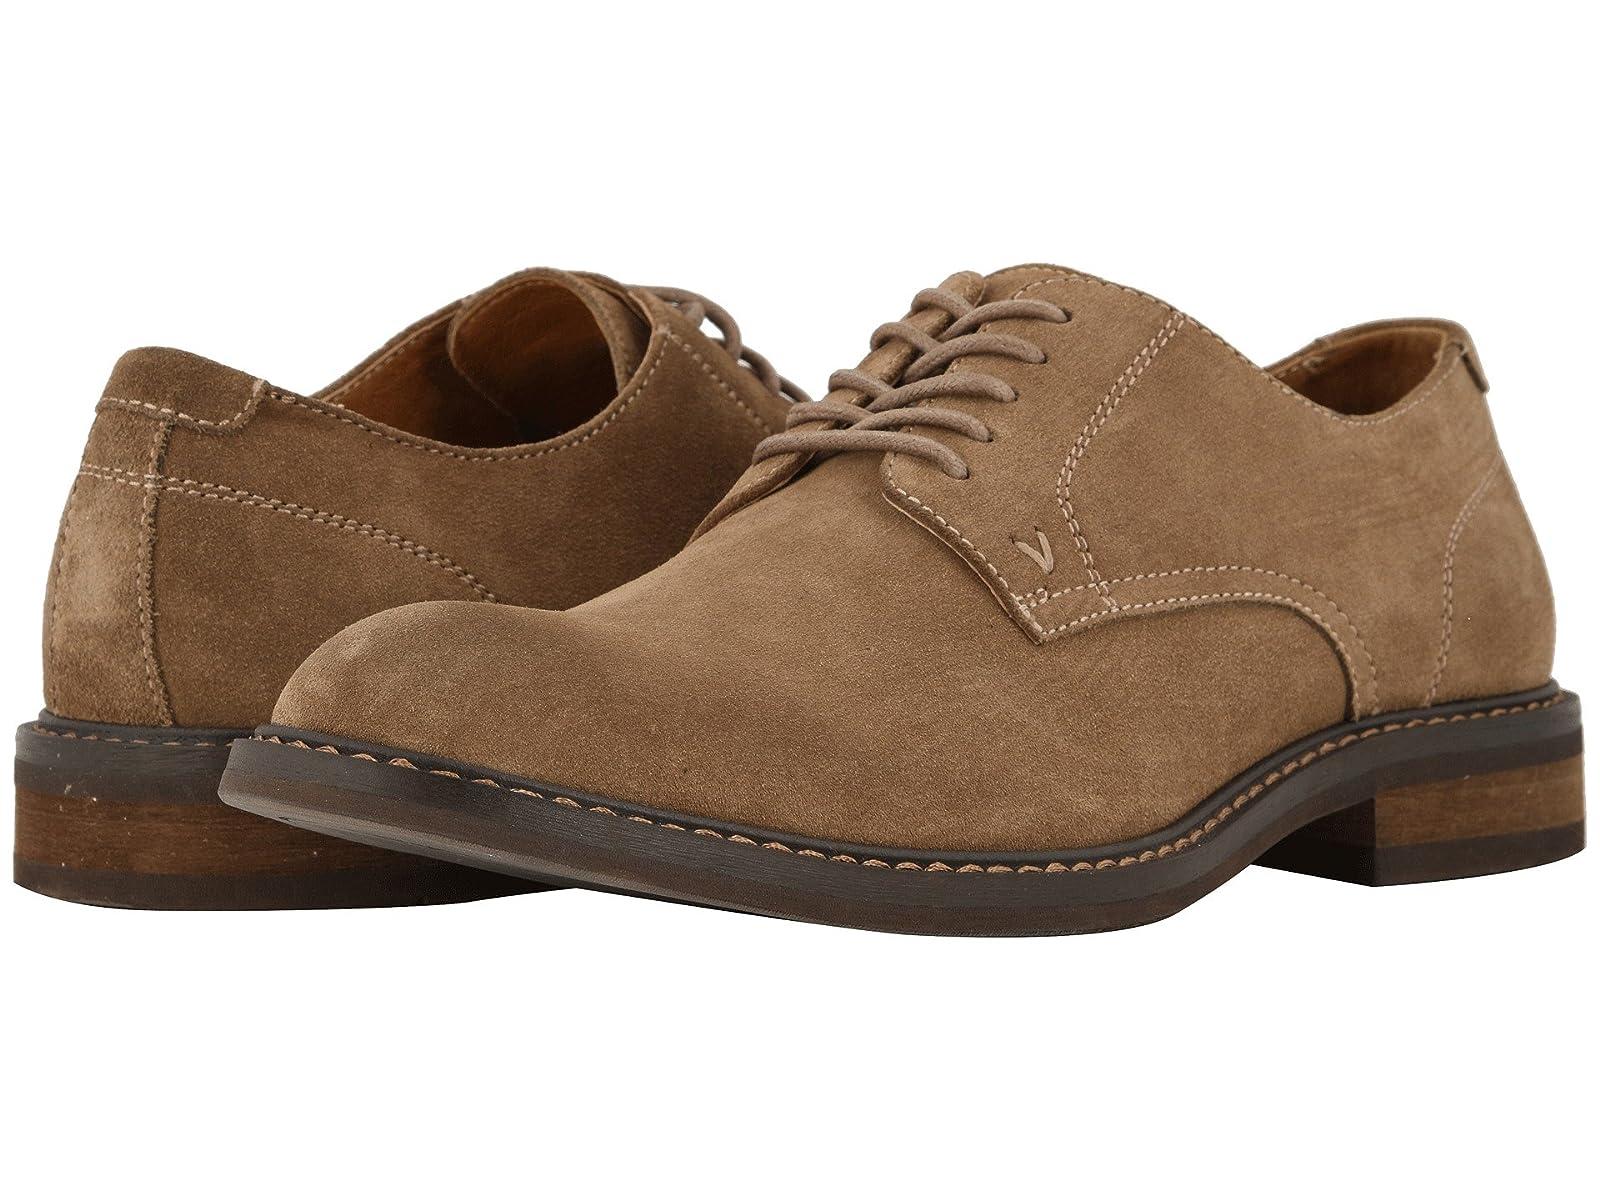 VIONIC GrahamAtmospheric grades have affordable shoes